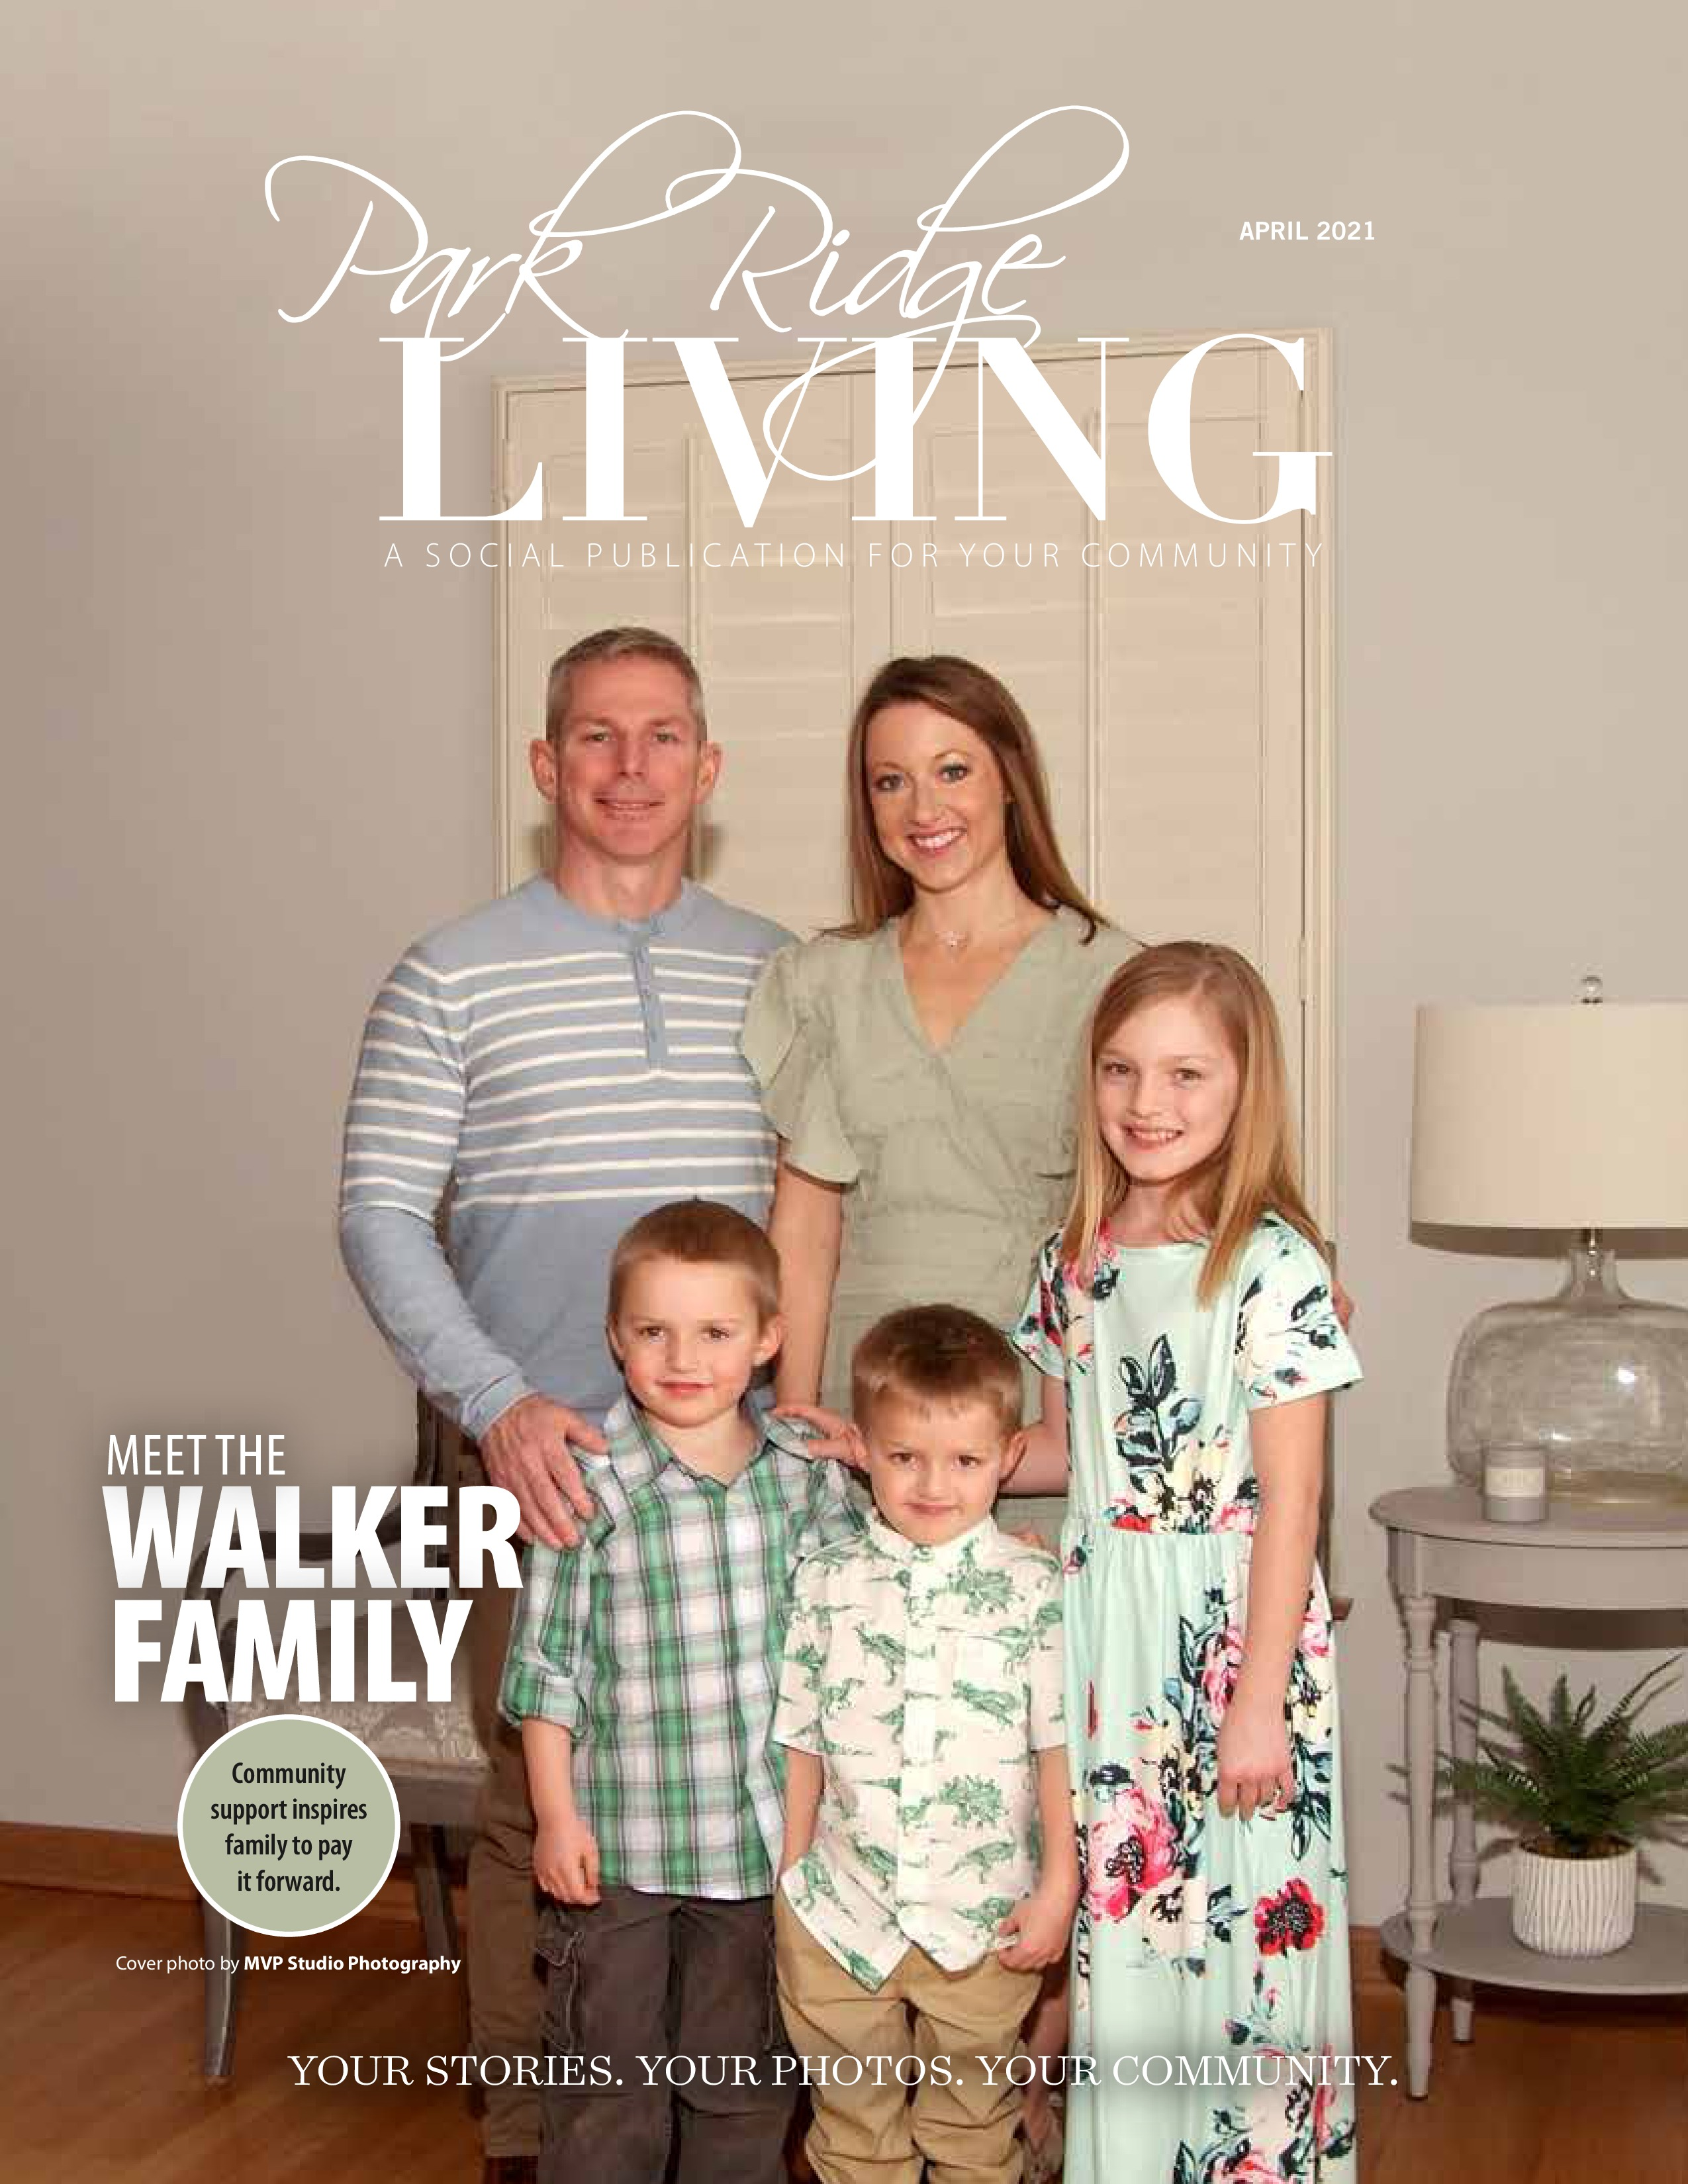 Park Ridge Living 2021-04-01